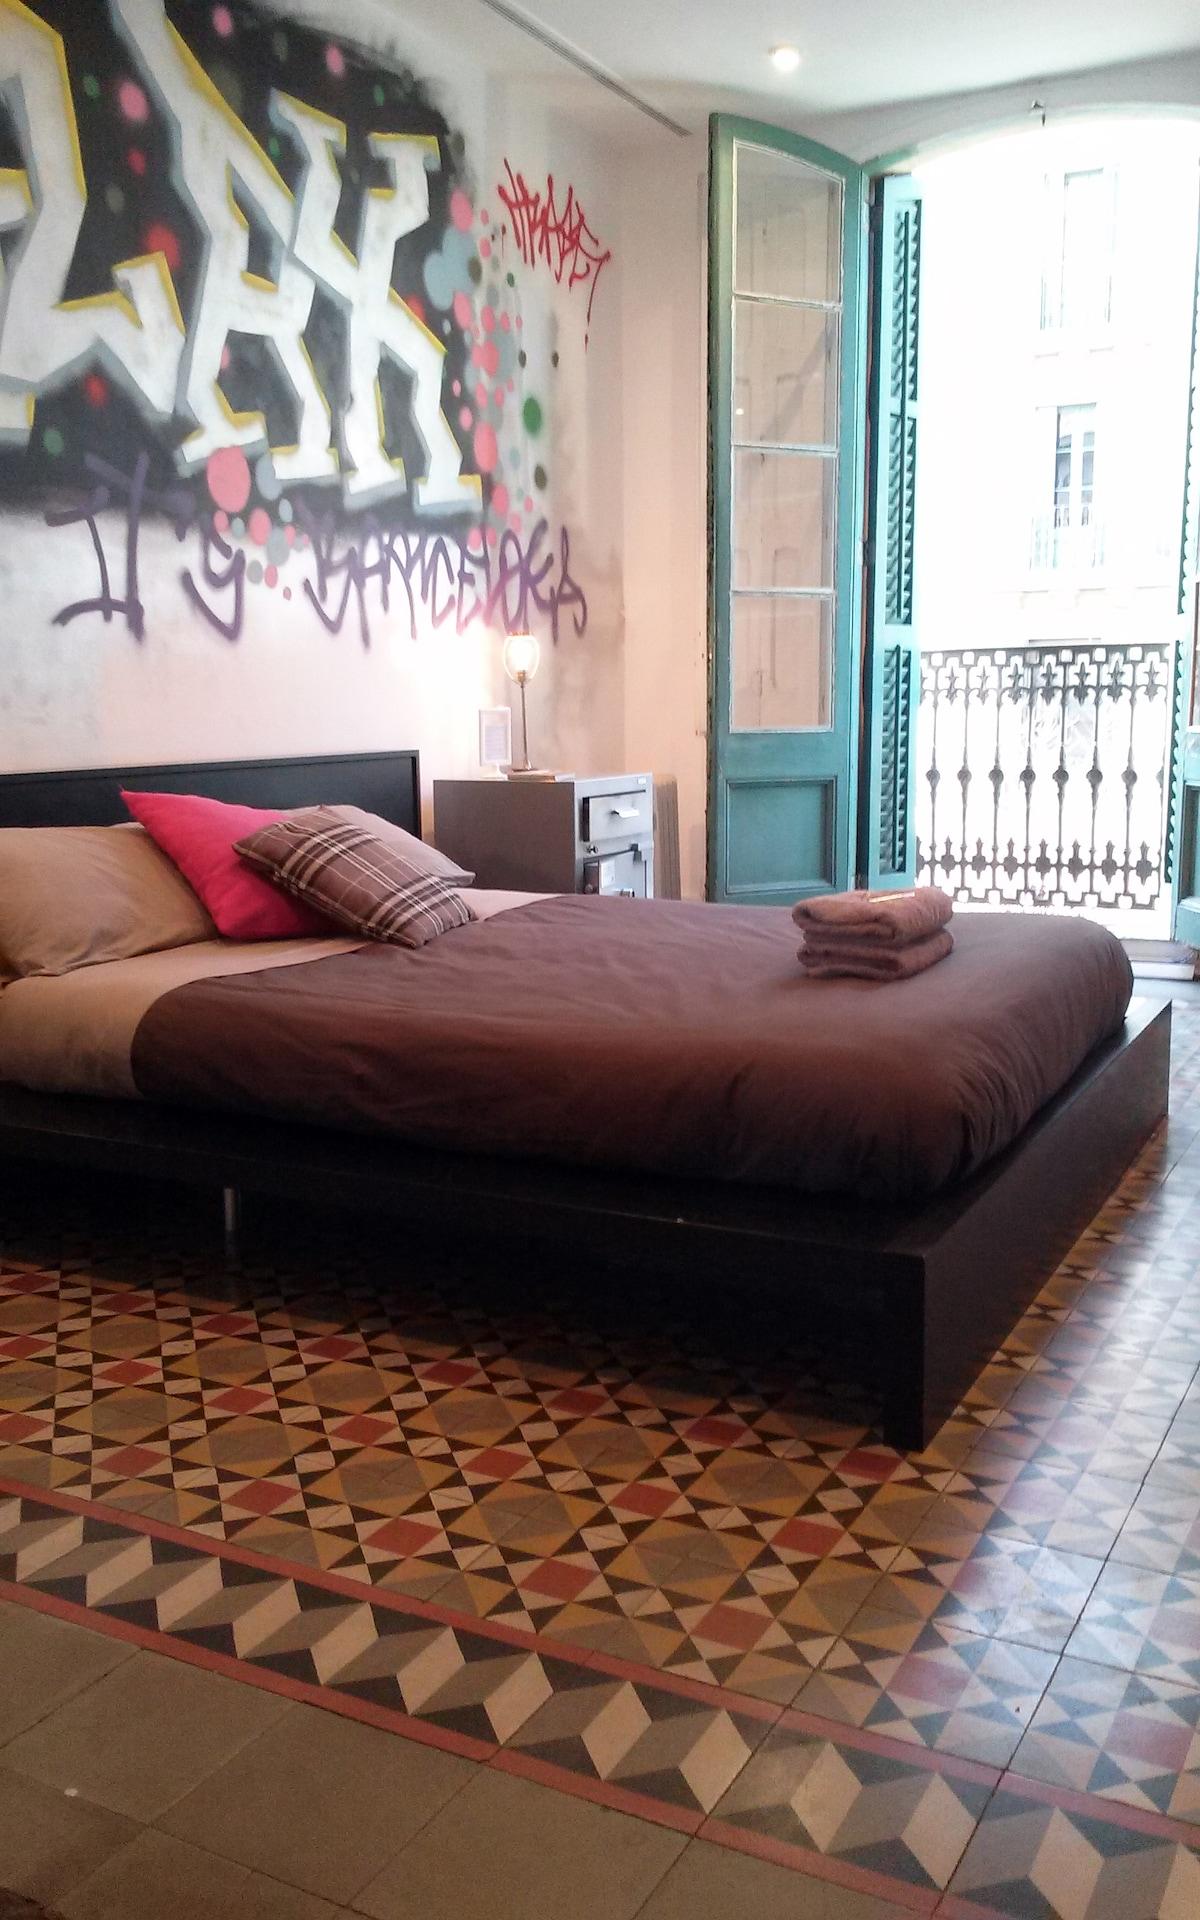 Cool Graffiti Room! Plaza Catalunya